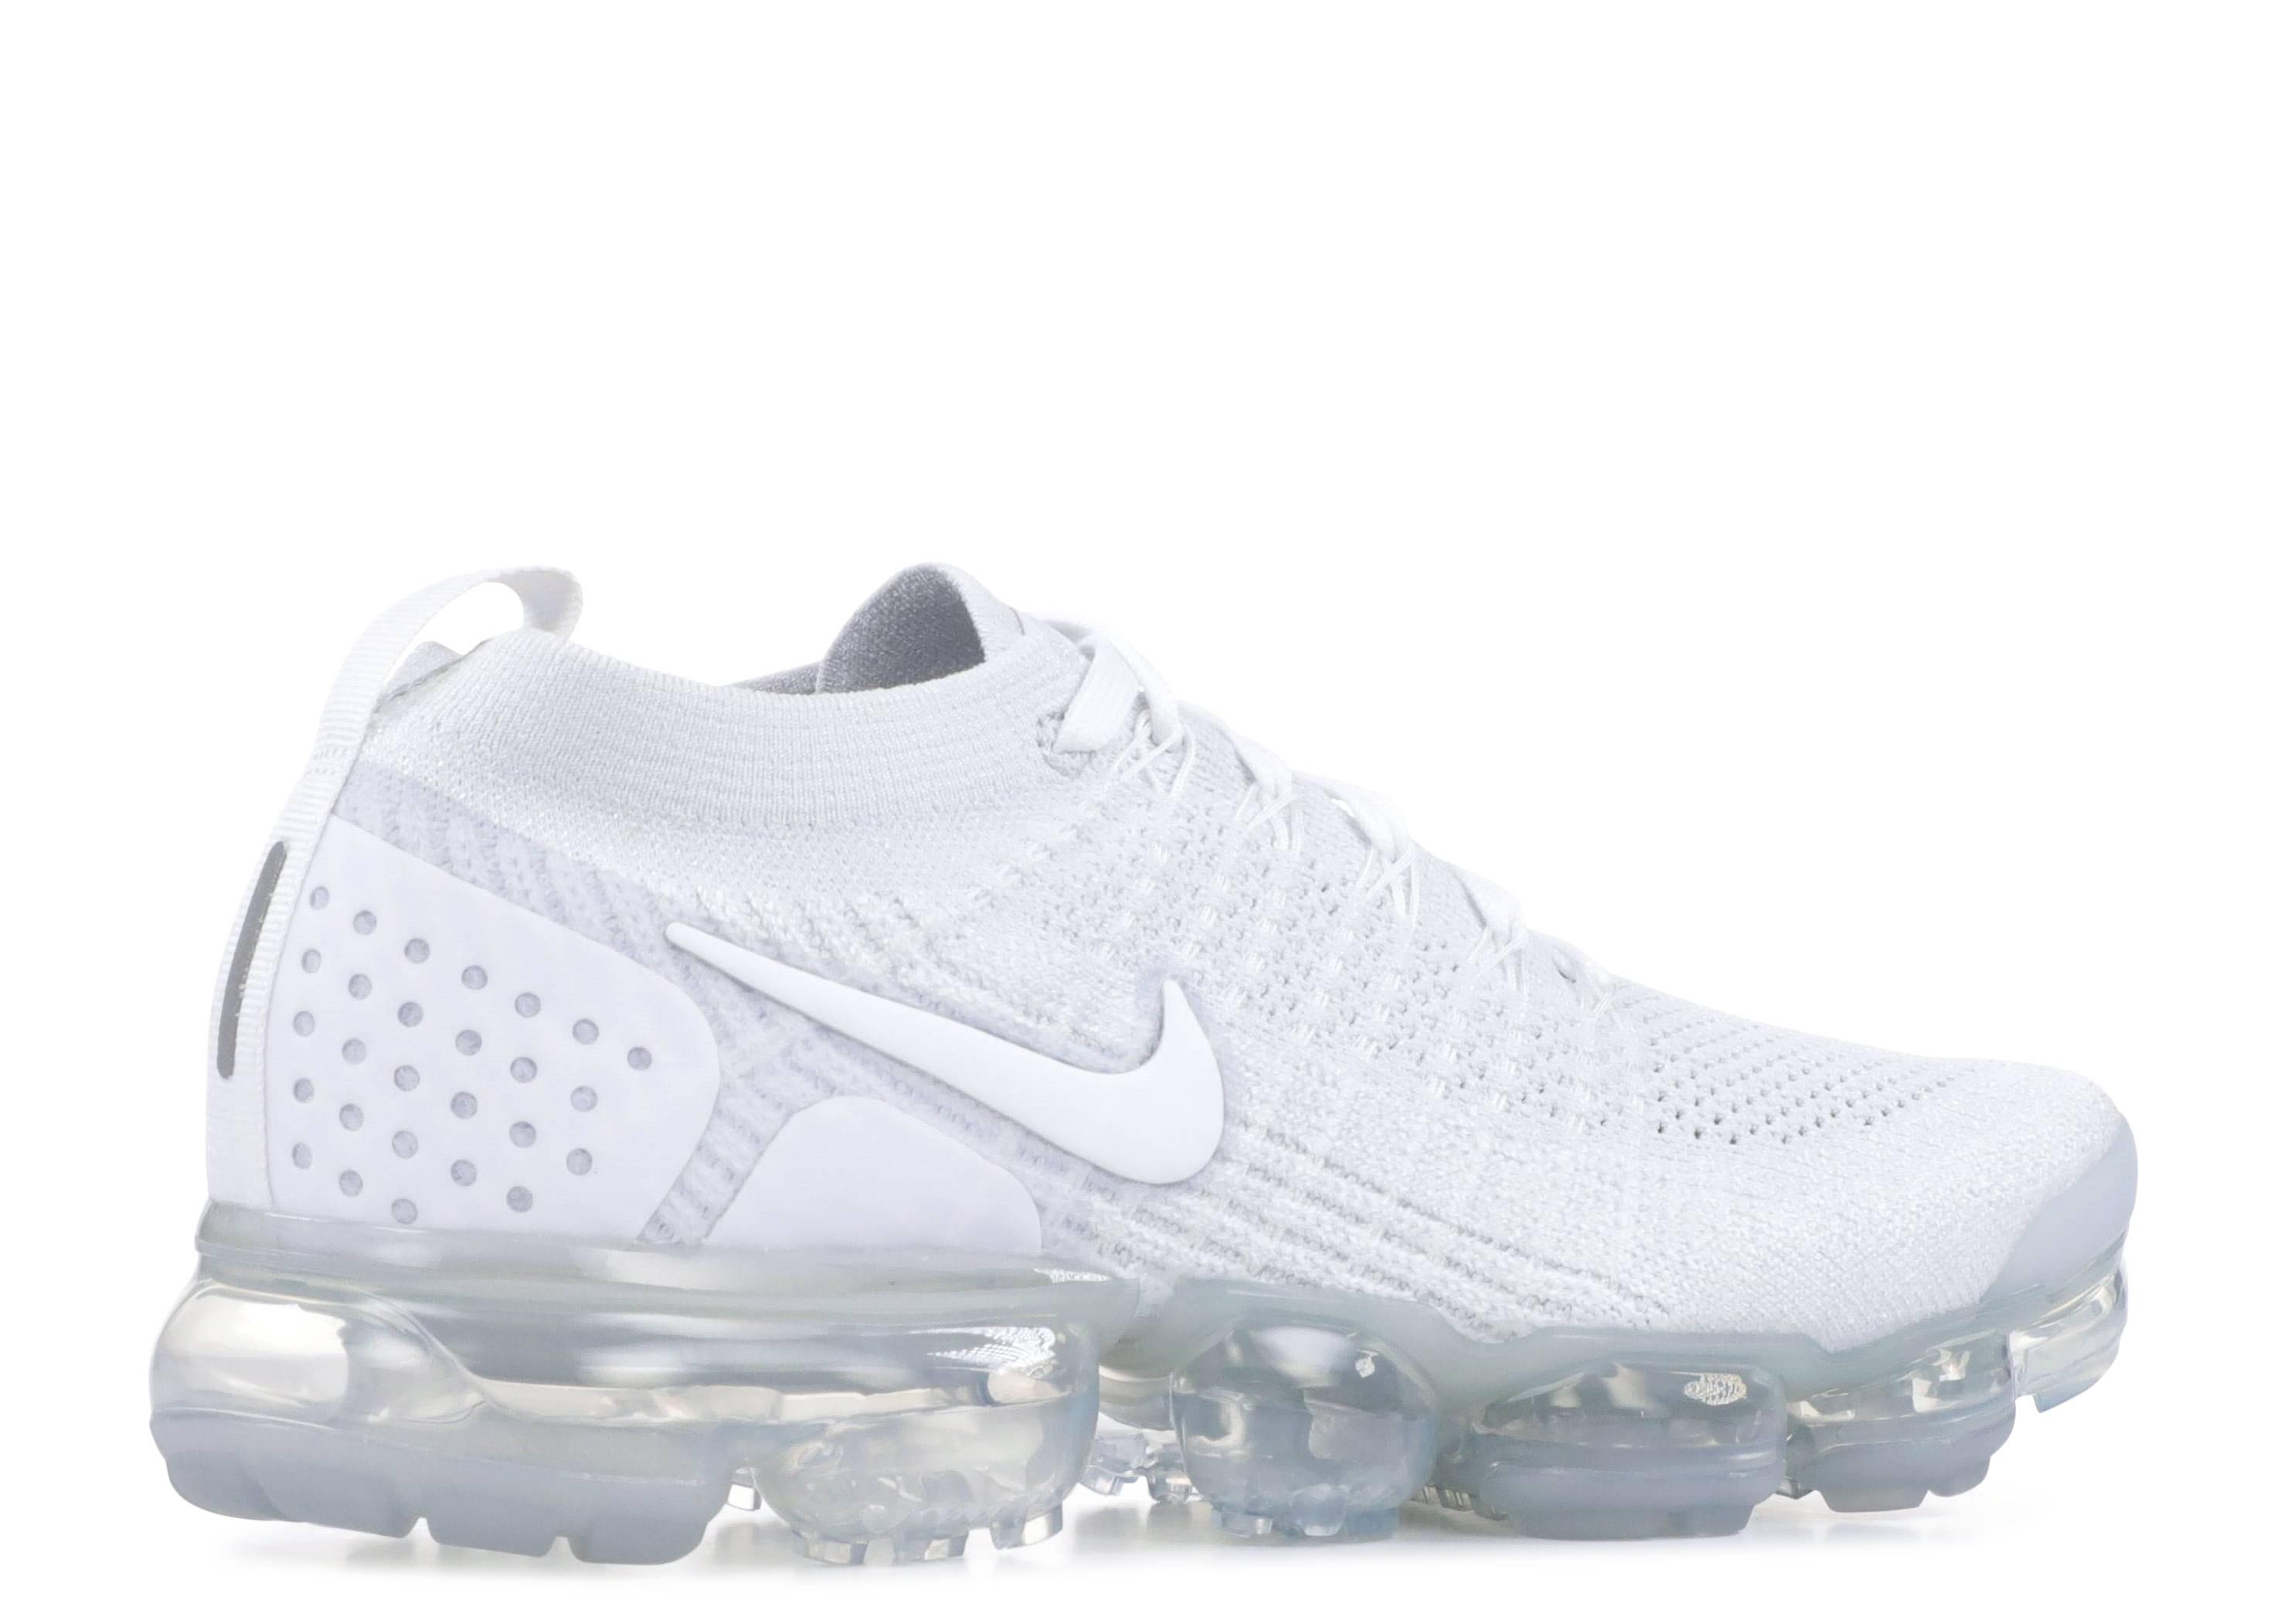 484032d049c W Nike Air Vapormax Flyknit 2